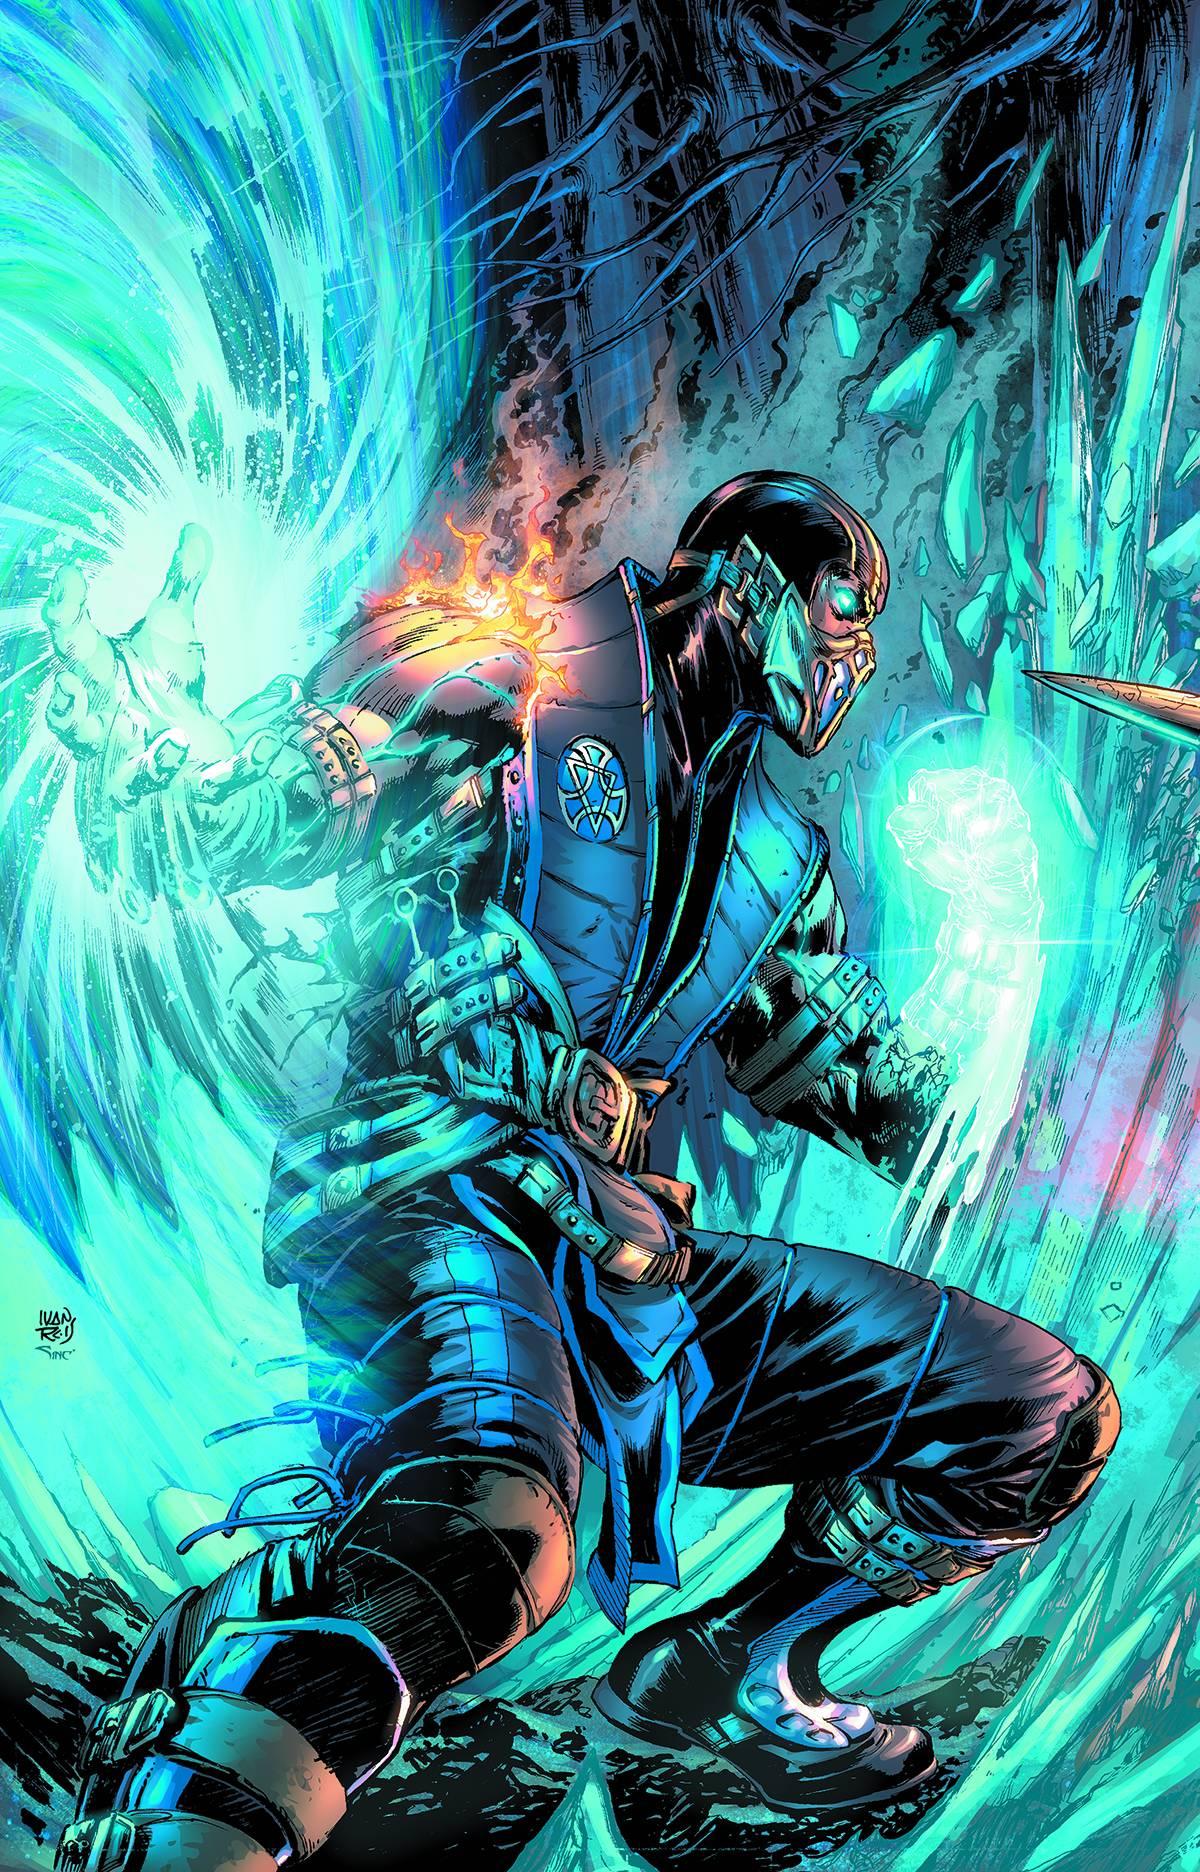 5120x2880 Scorpion Mortal Kombat Ice and Fire Art 5K